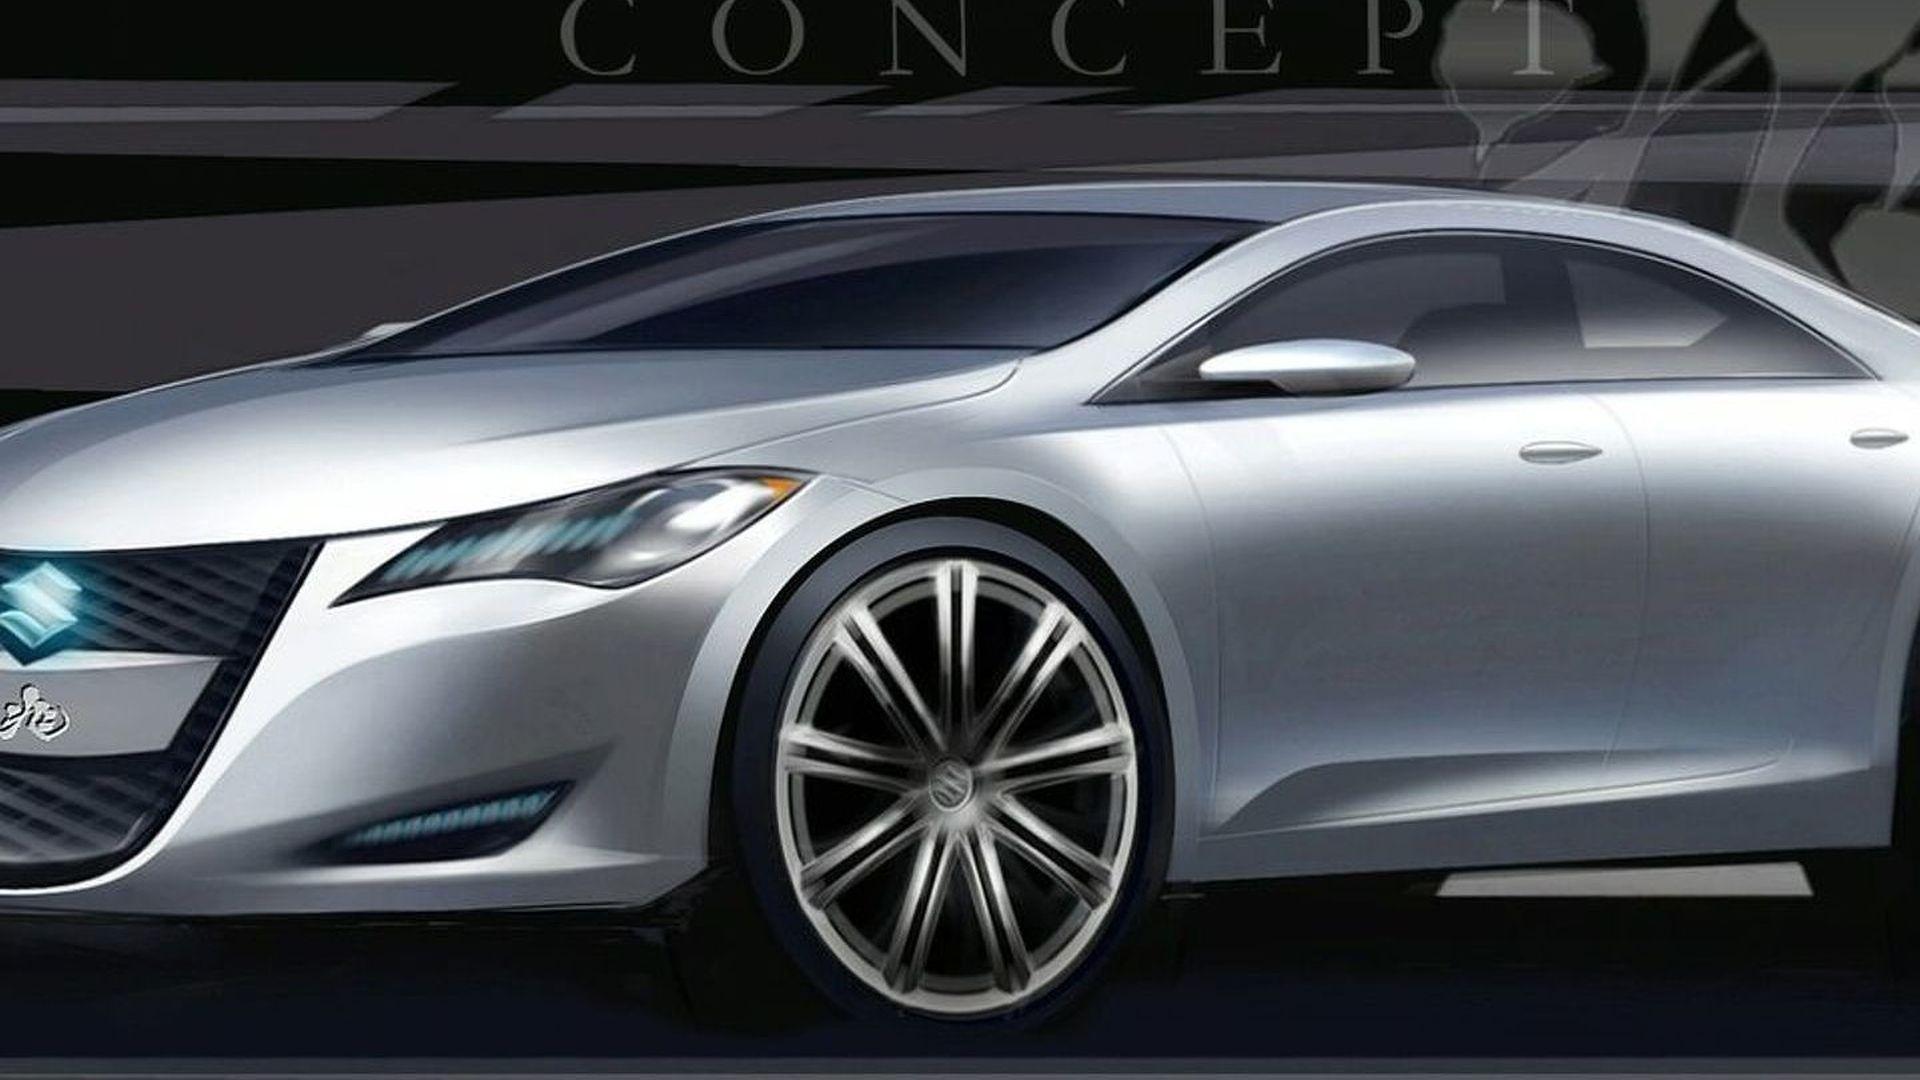 Suzuki Kizashi 3 Concept Headed for New York